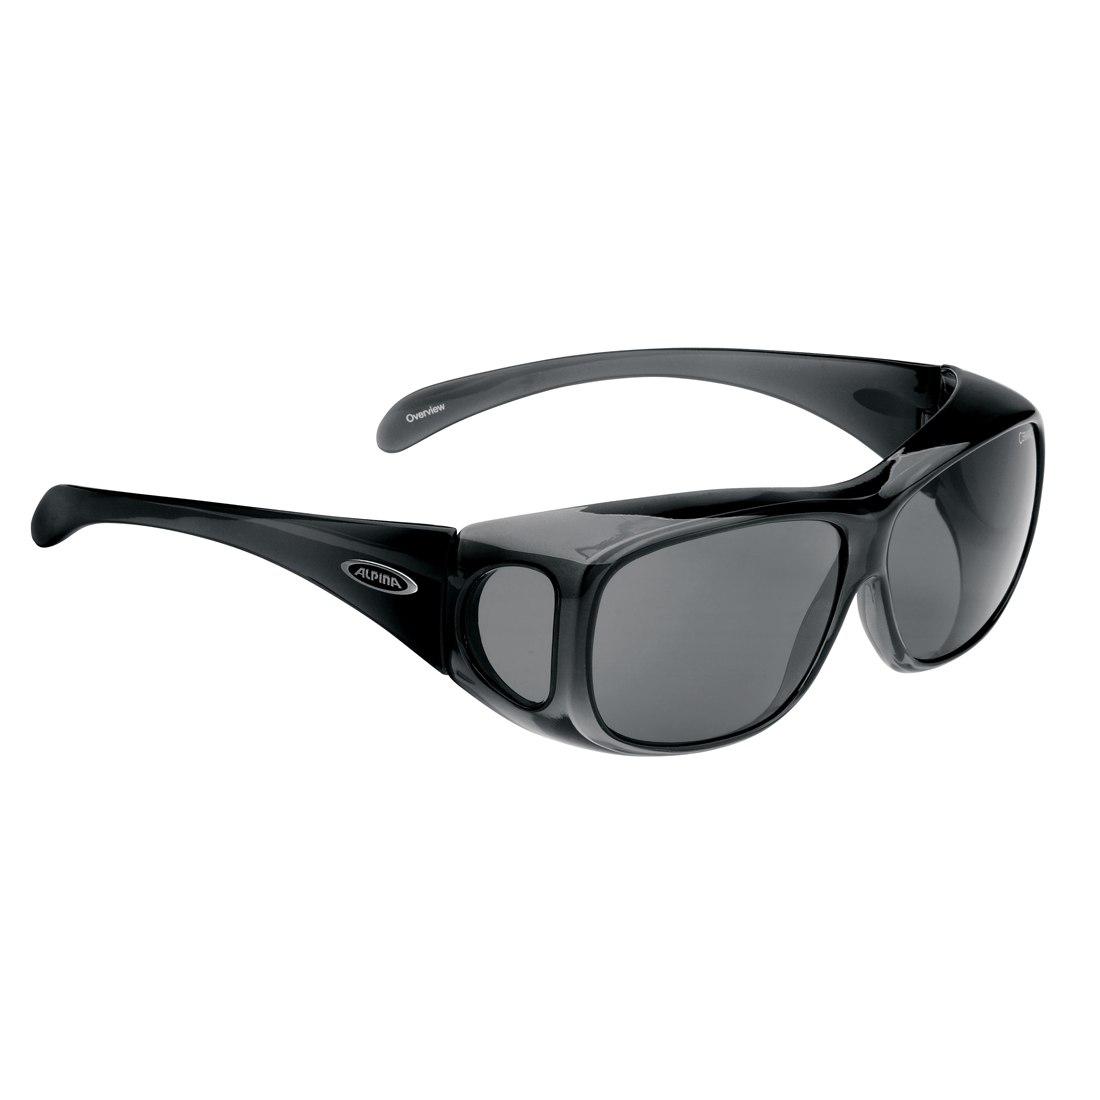 Alpina Overview - Black Transparent / Ceramic Black - Glasses